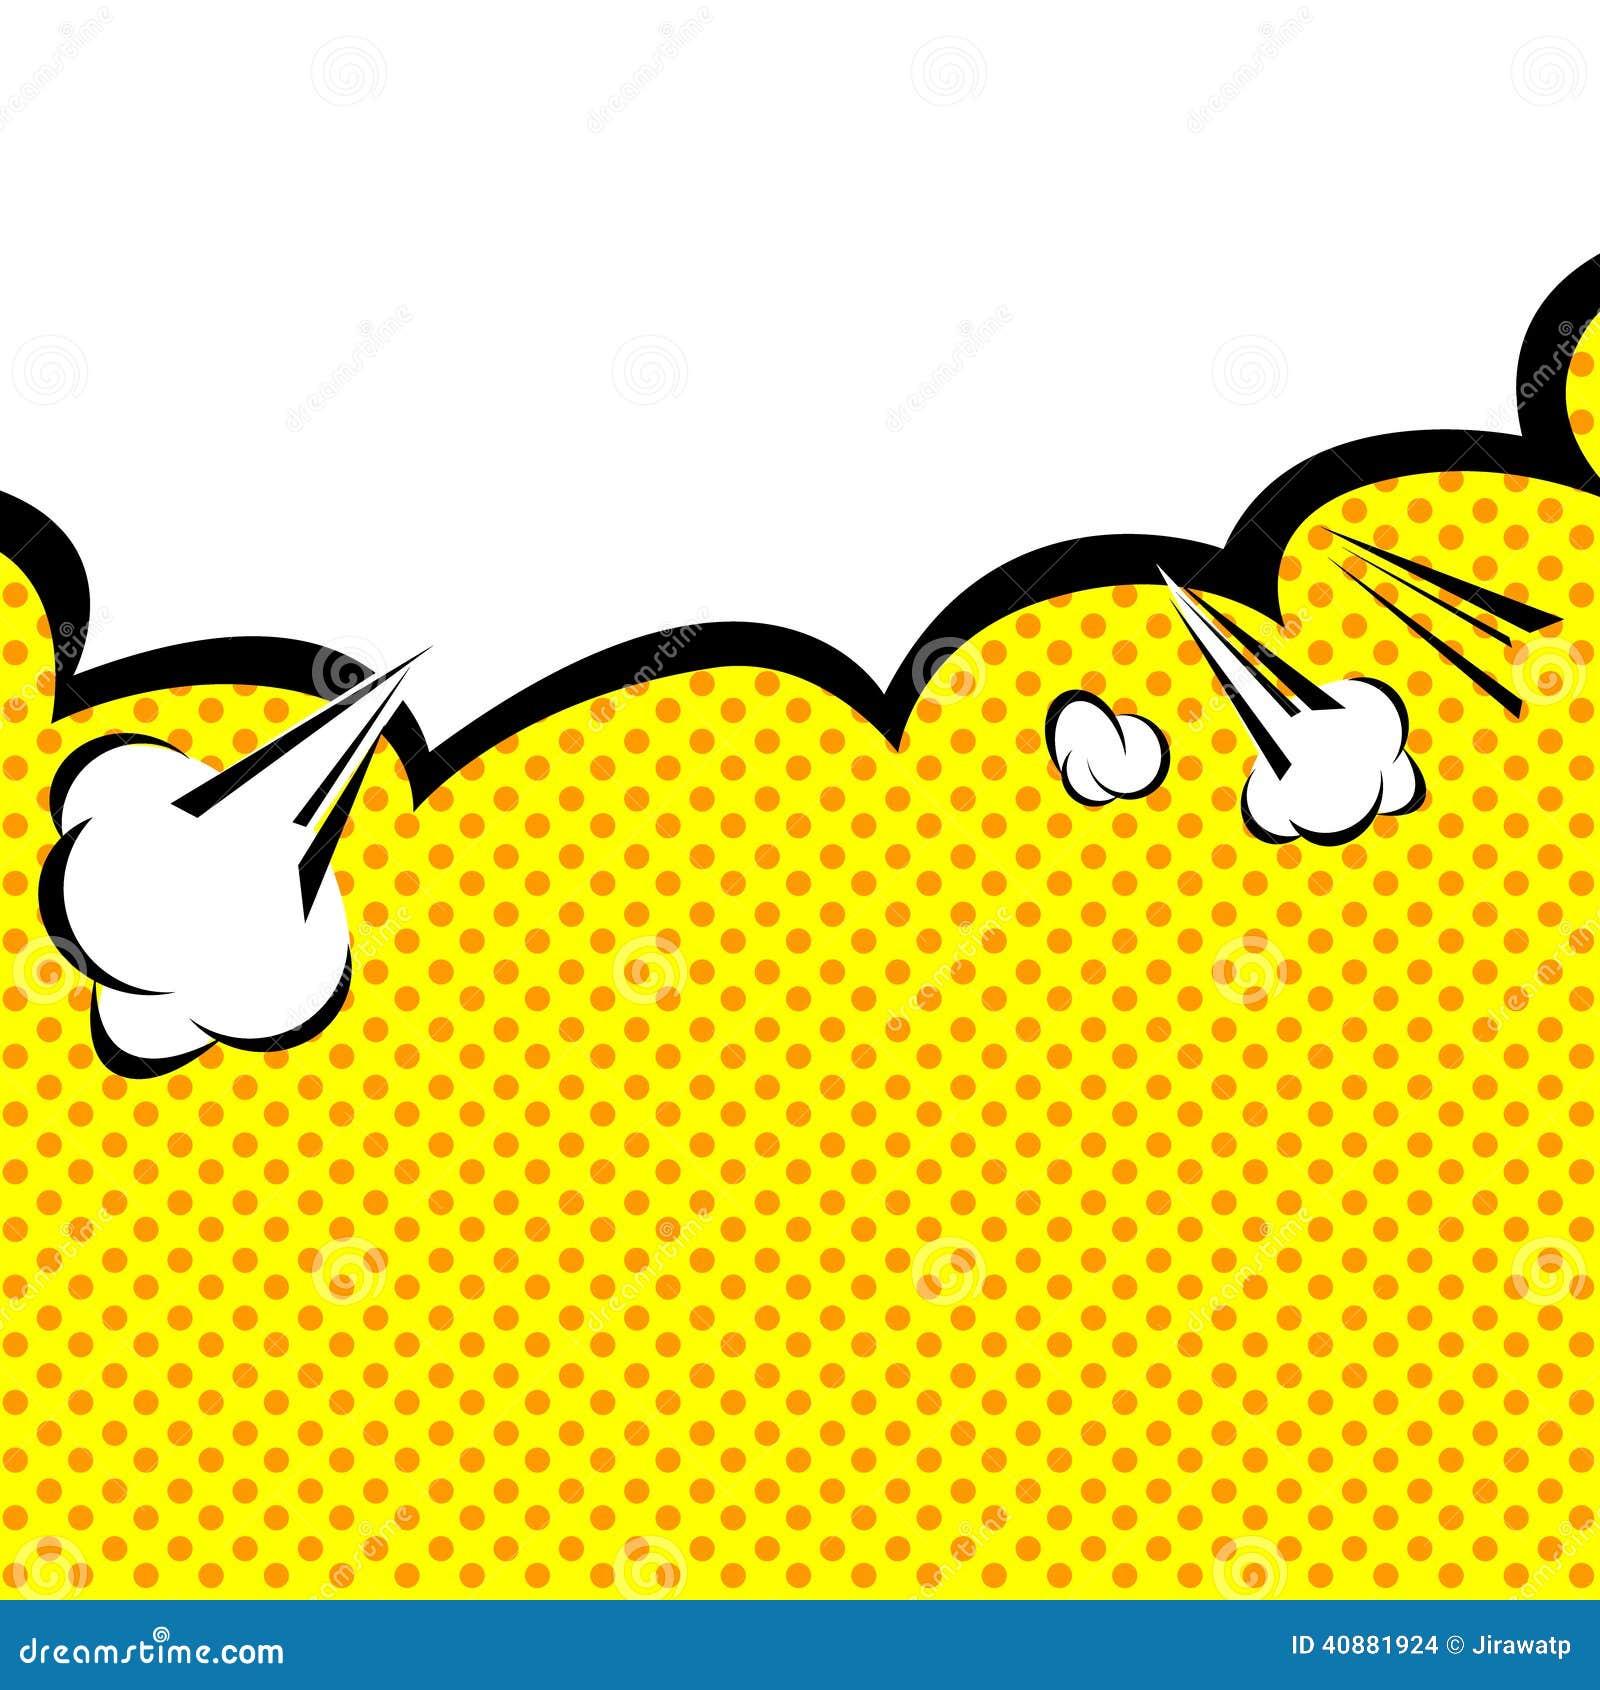 Speech bubble pop art style stock vector image 40881924 speech bubble pop art style toneelgroepblik Choice Image